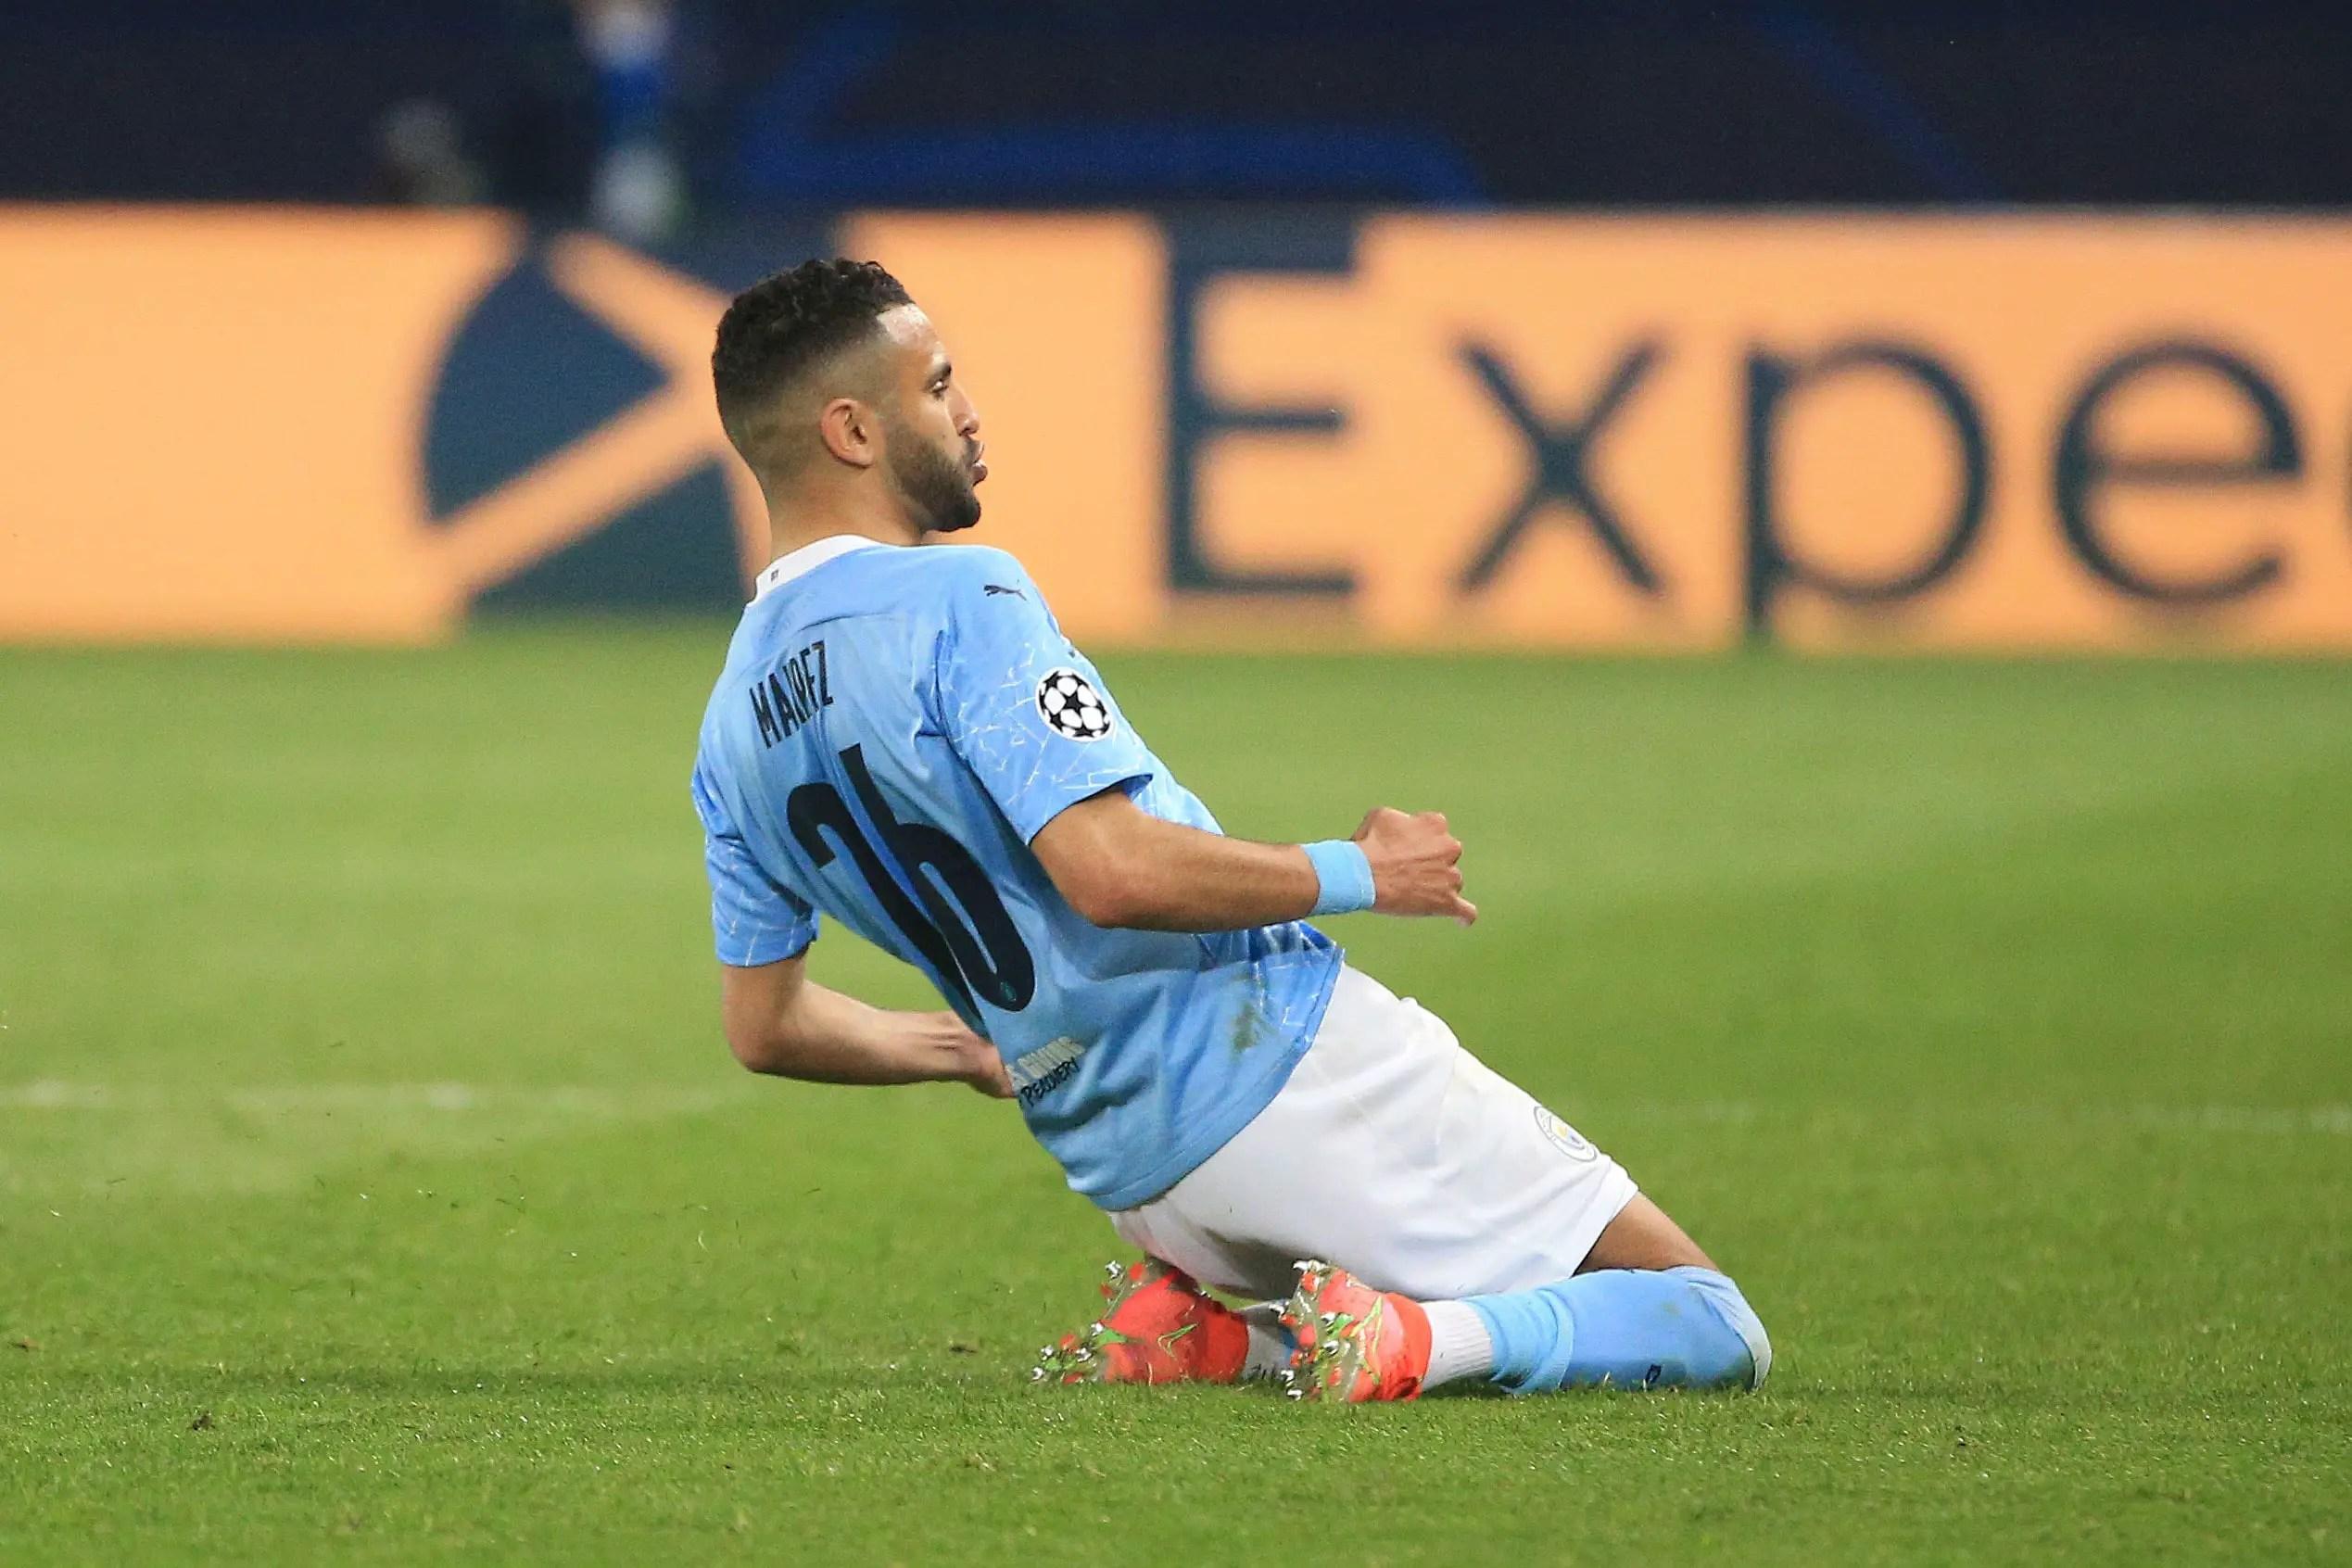 Manchester City Floor PSG, Reach First Champions League Final